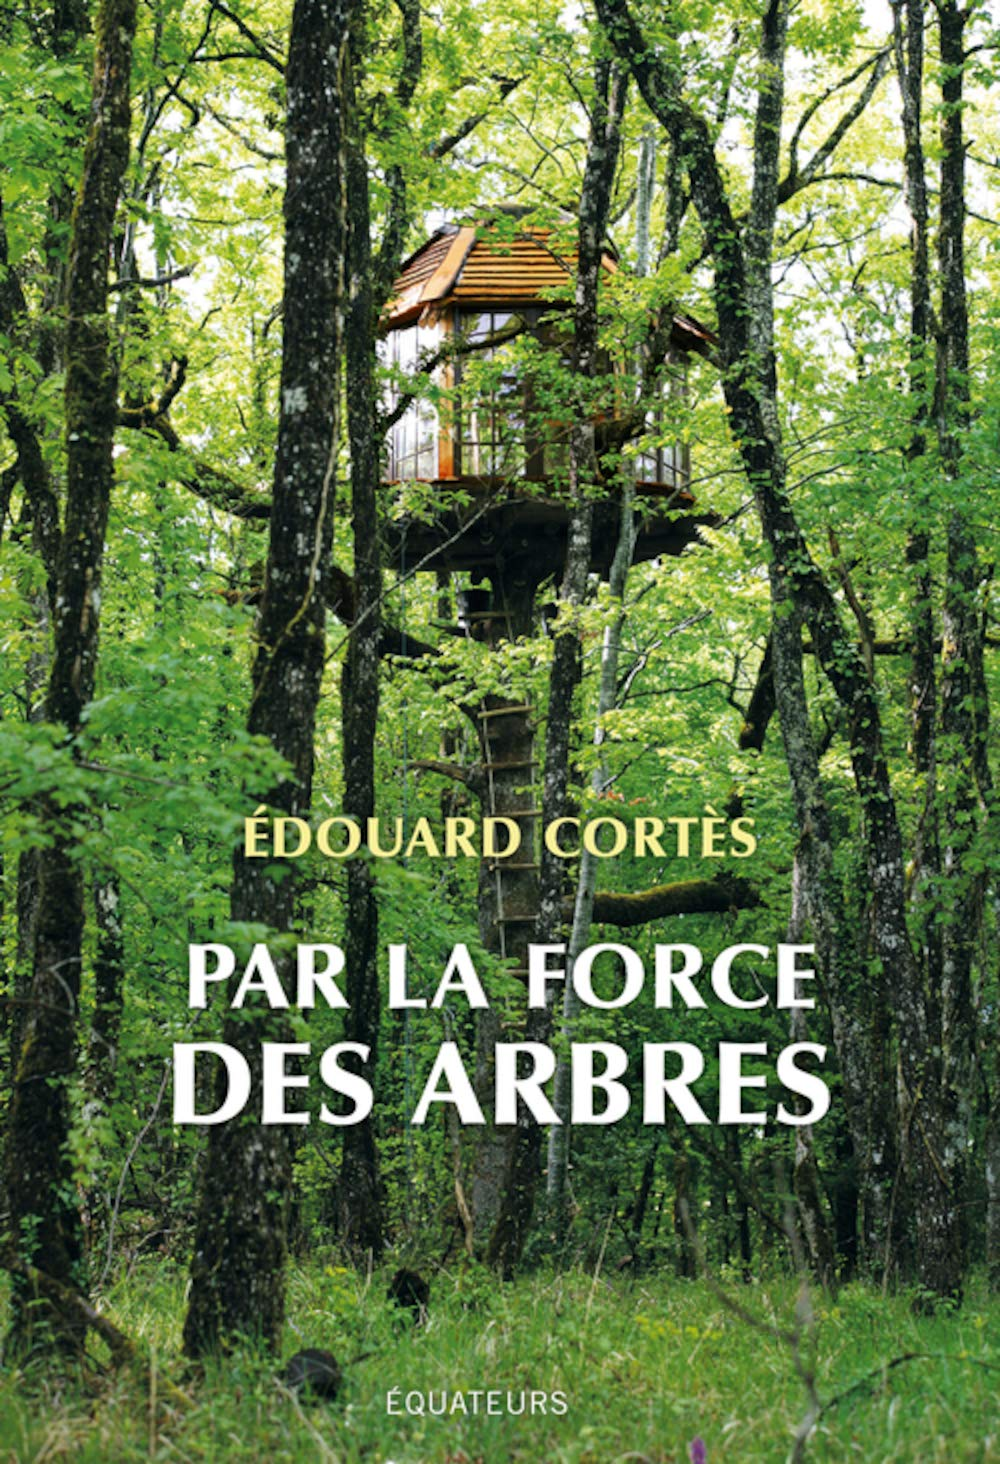 Edouard Cortès